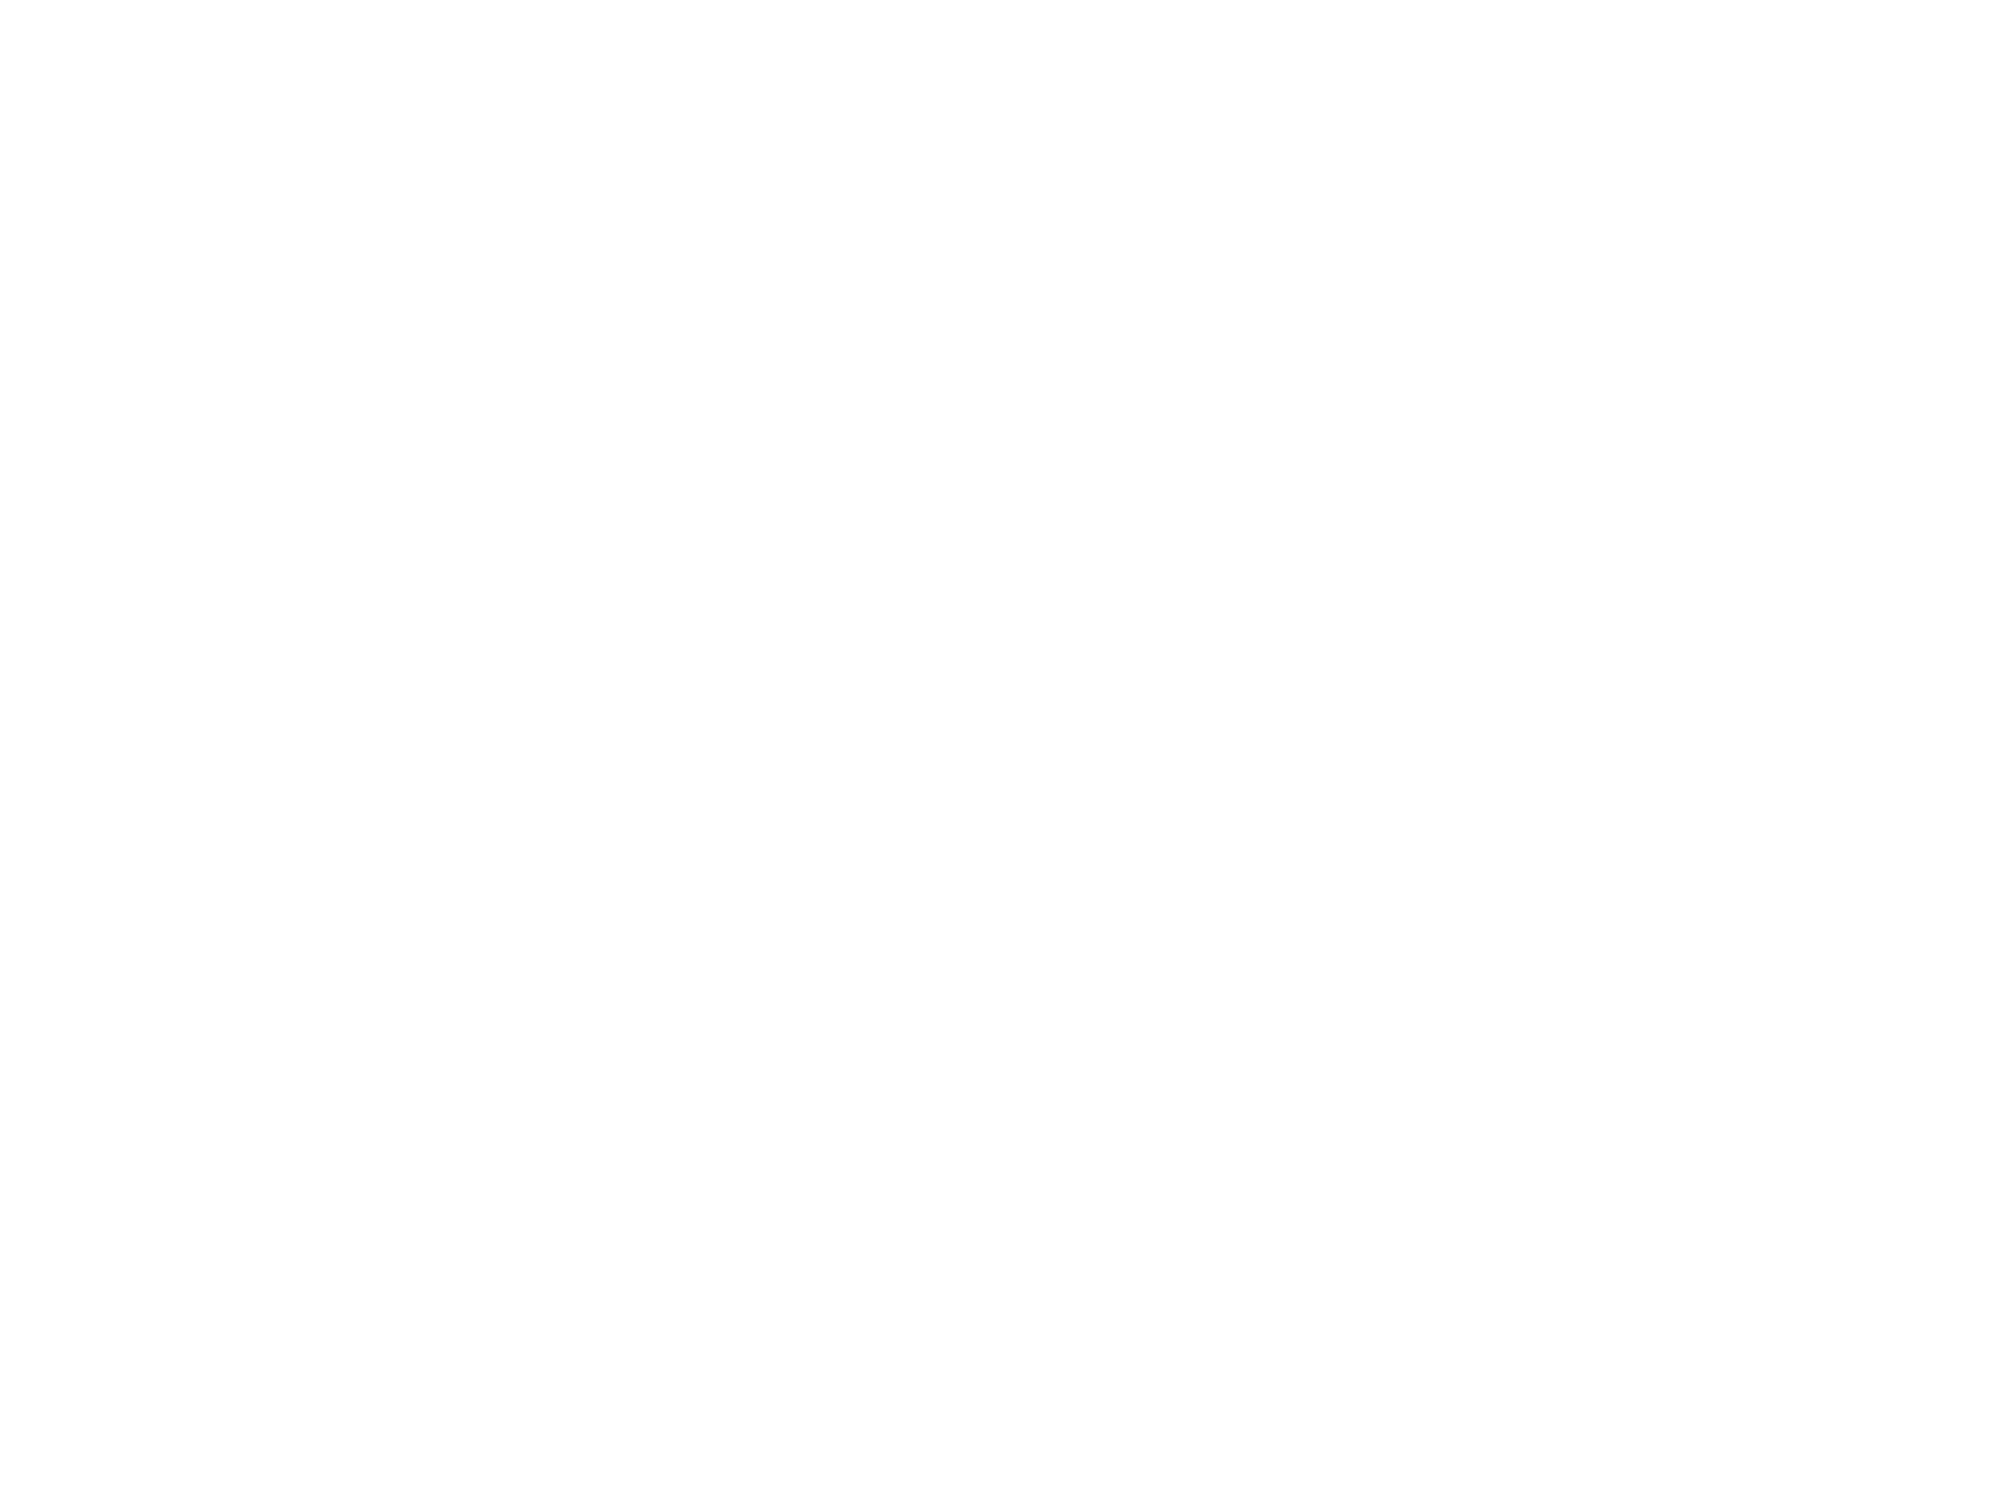 Media1Music